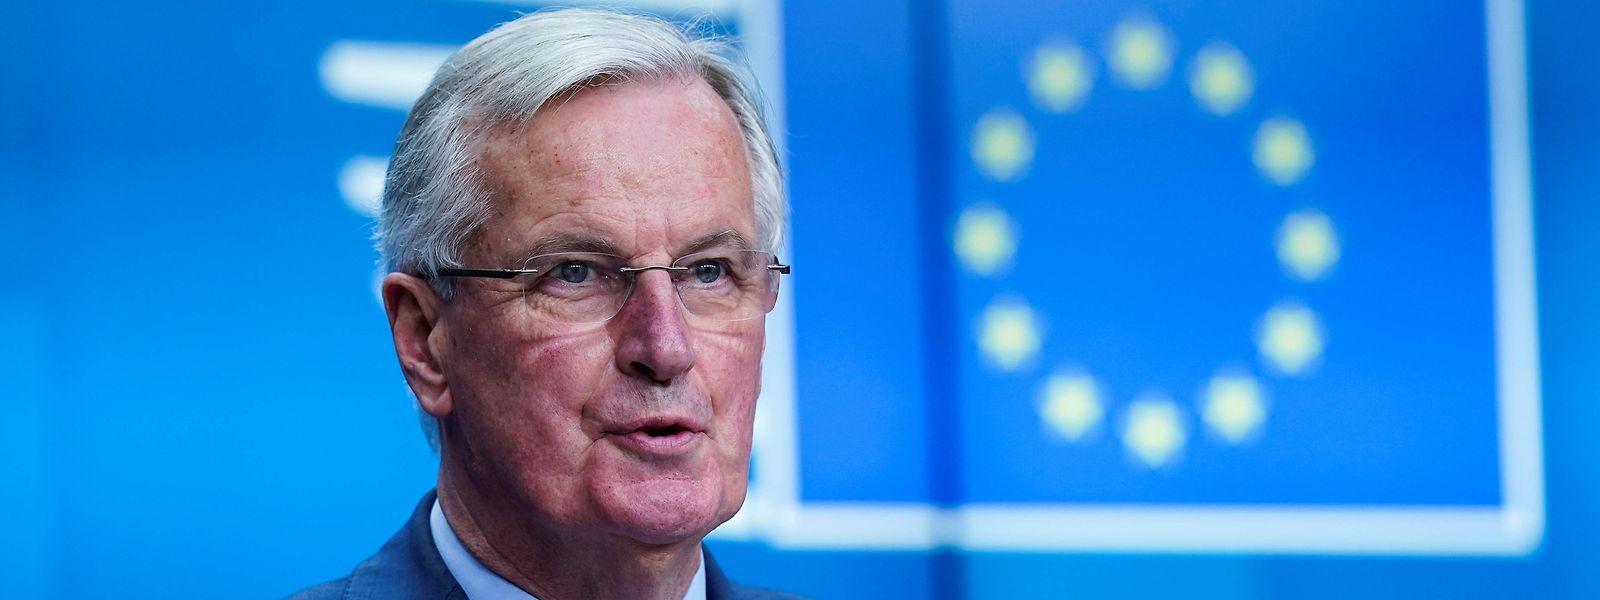 Le négociateur en chef de l'UE Michel Barnier rencontre ce lundi son homologue britannique David Frost.